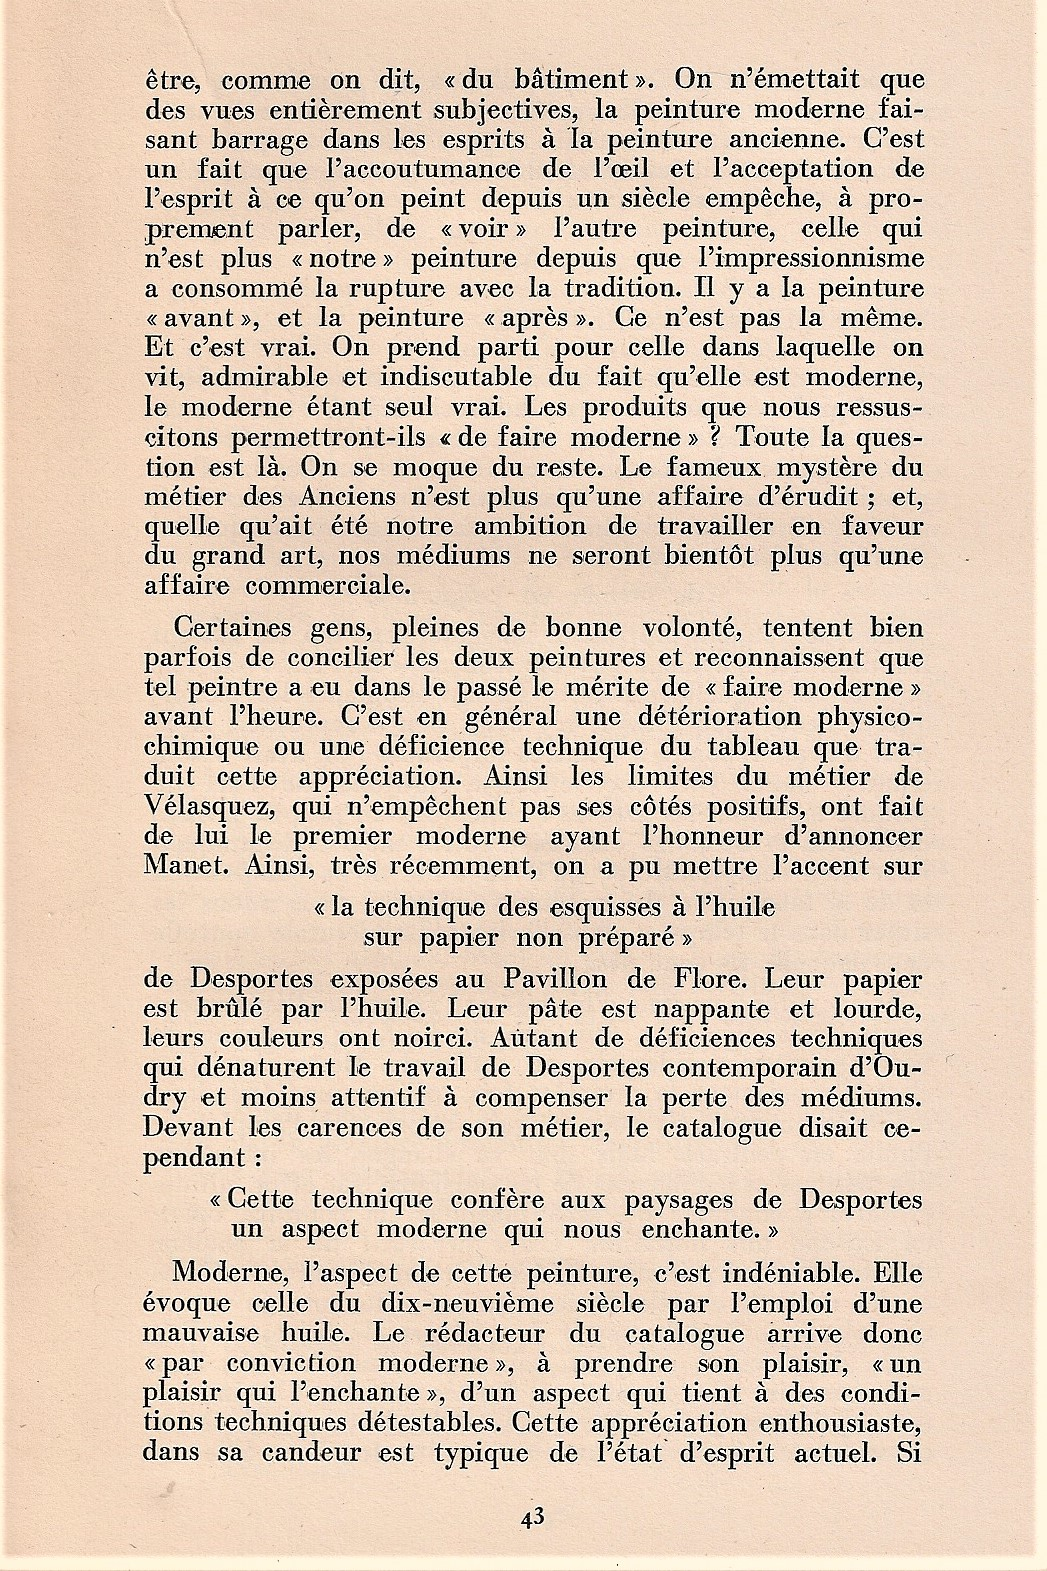 versini-page-43.jpg